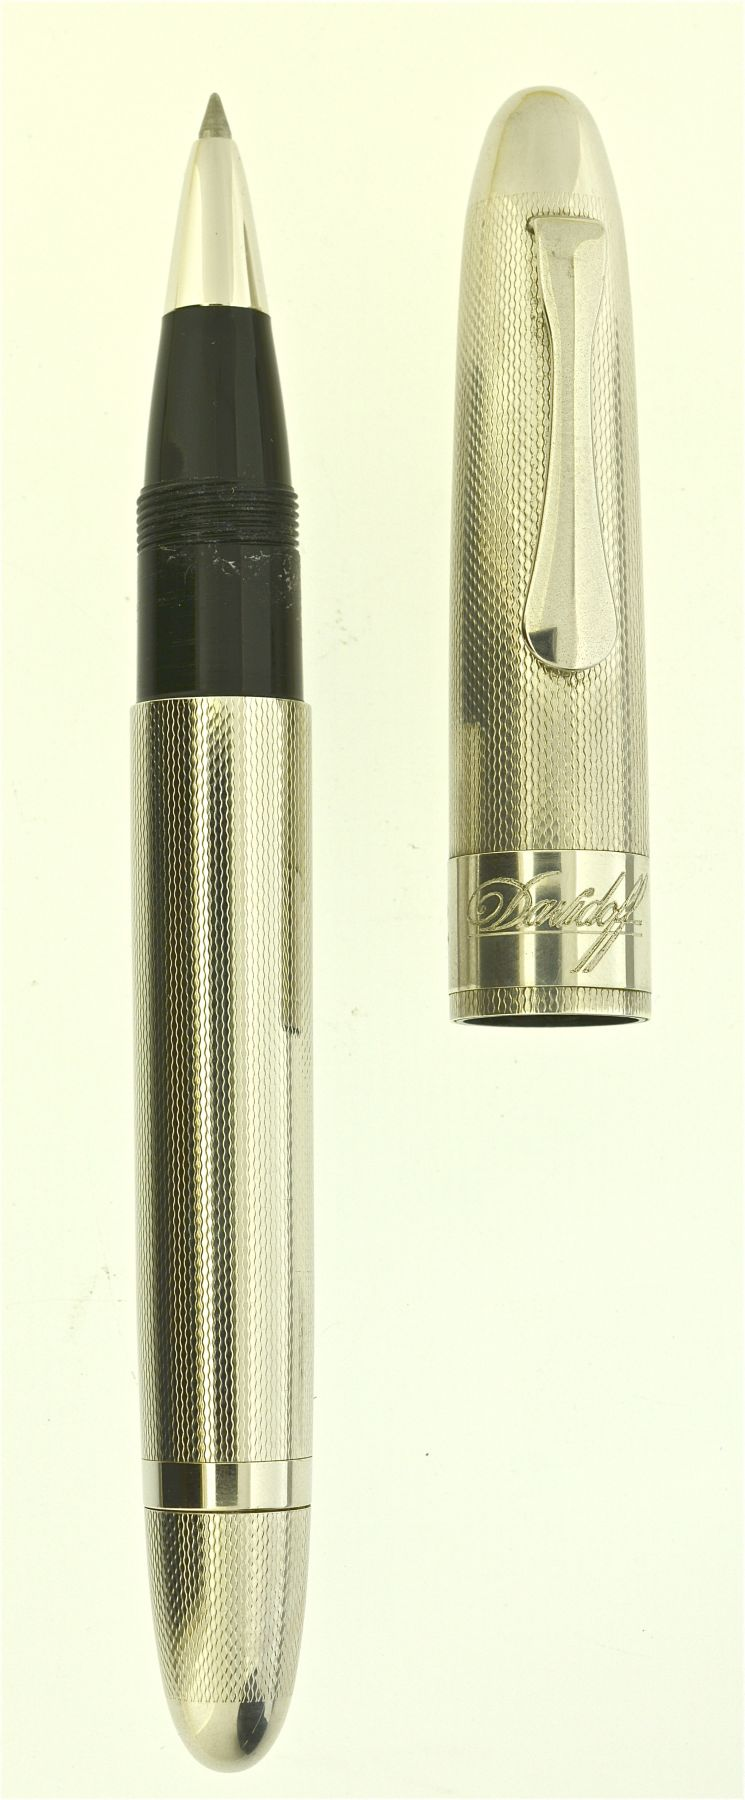 Michel Audiard Sculpteur Stylo catalogue de la vente stylomania à artcurial - fin de la